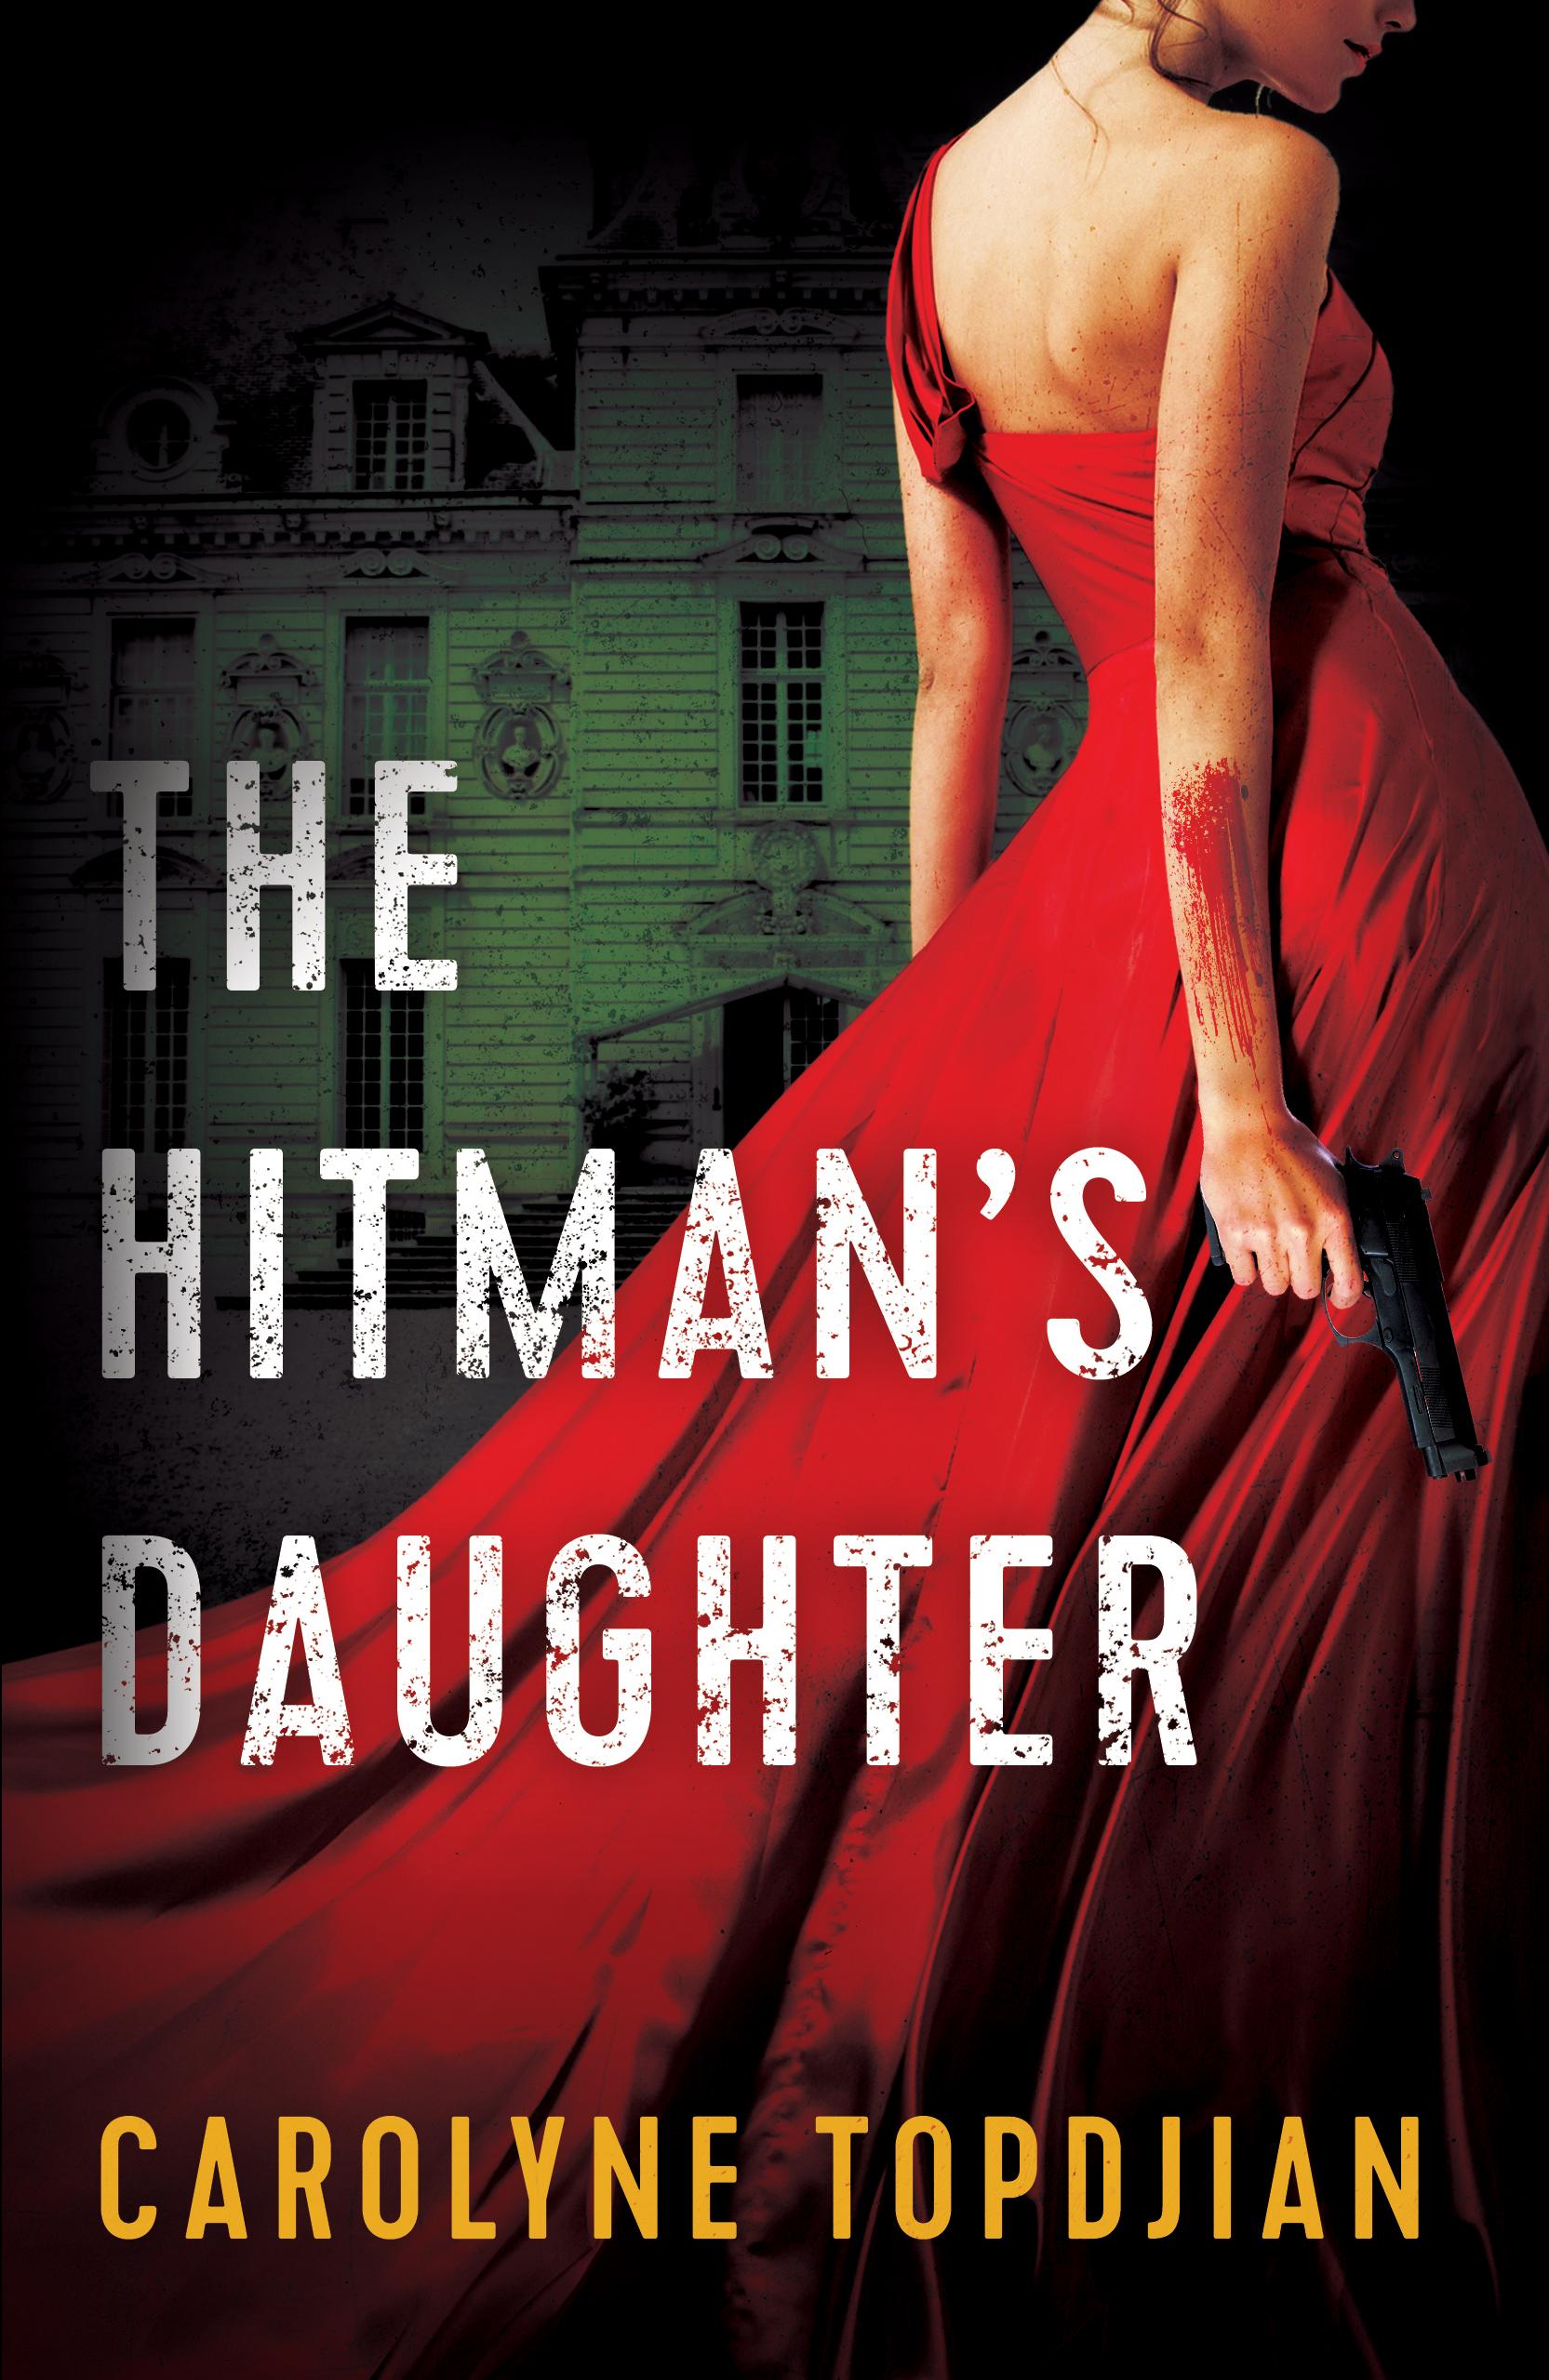 The Hitman's Daughter